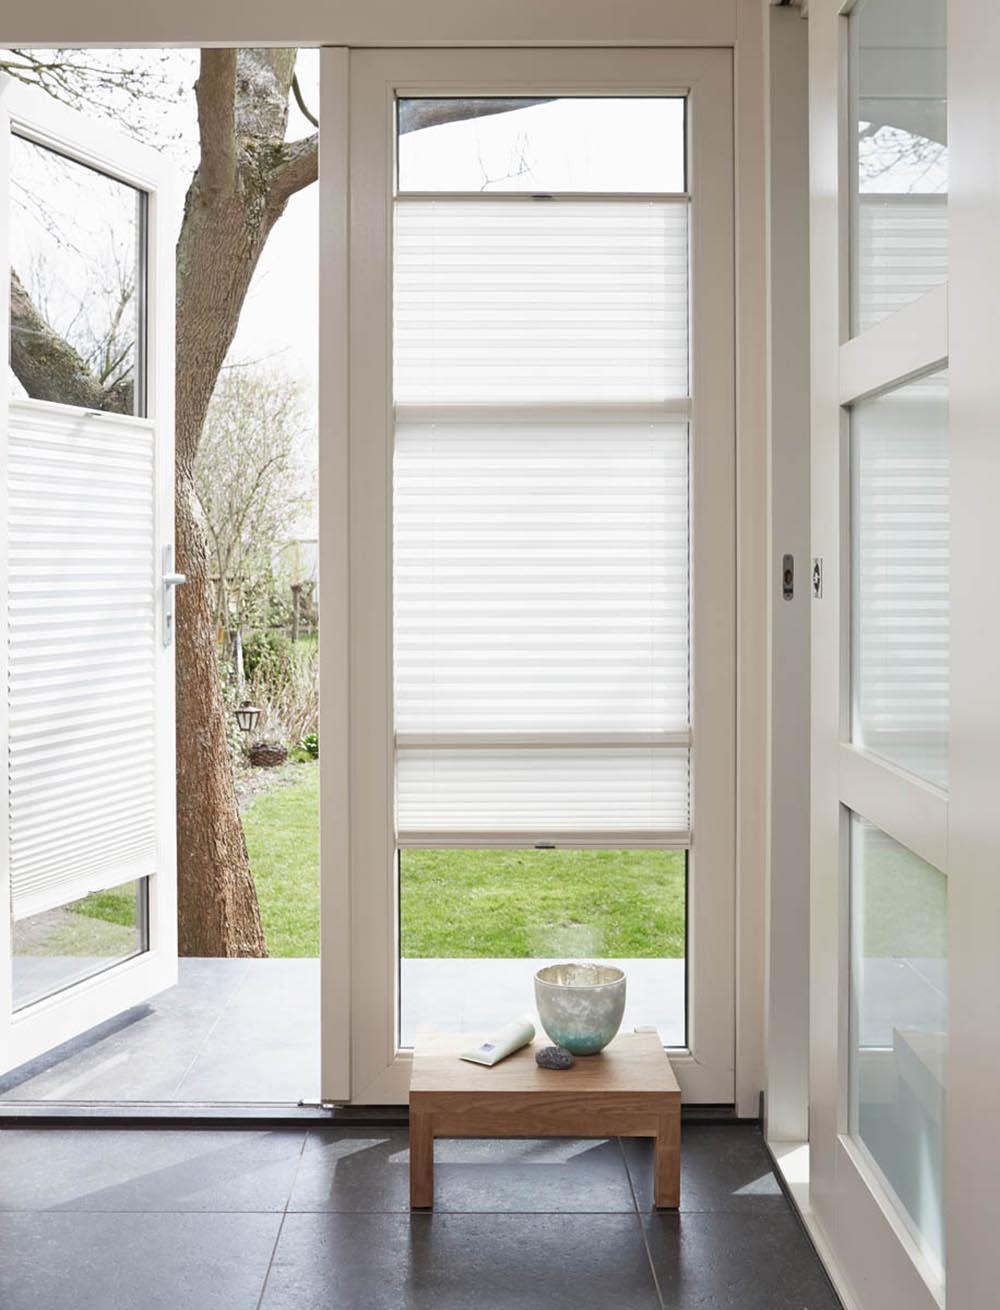 luxaflex pliss shades op maat inhuis plaza. Black Bedroom Furniture Sets. Home Design Ideas